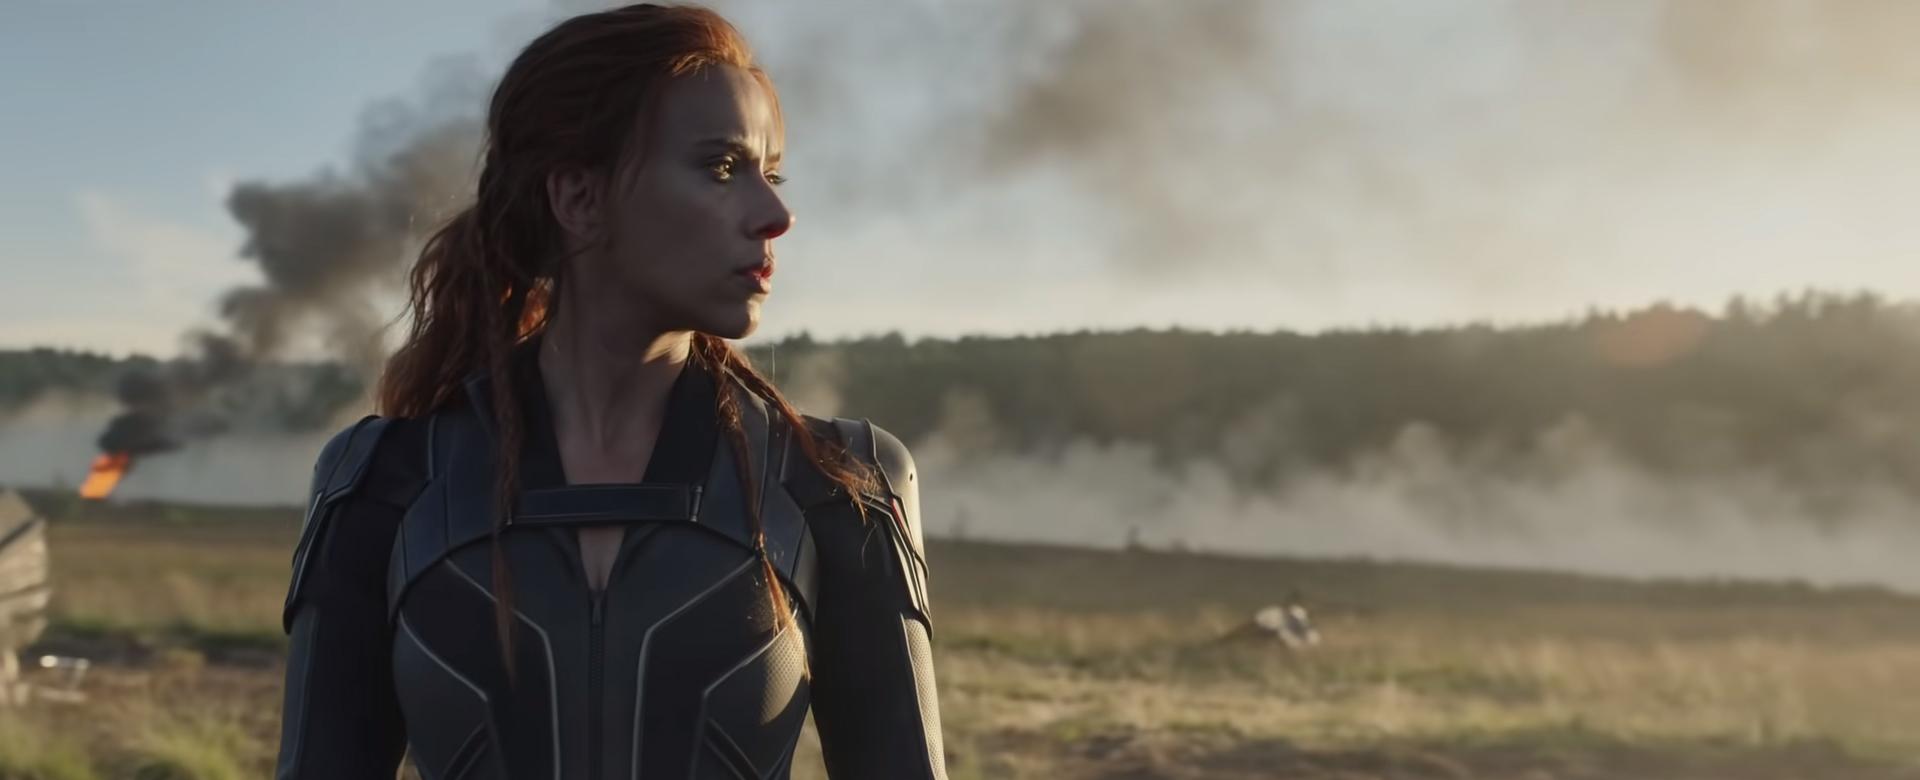 Black Widow. Image Credit: Marvel Studios.